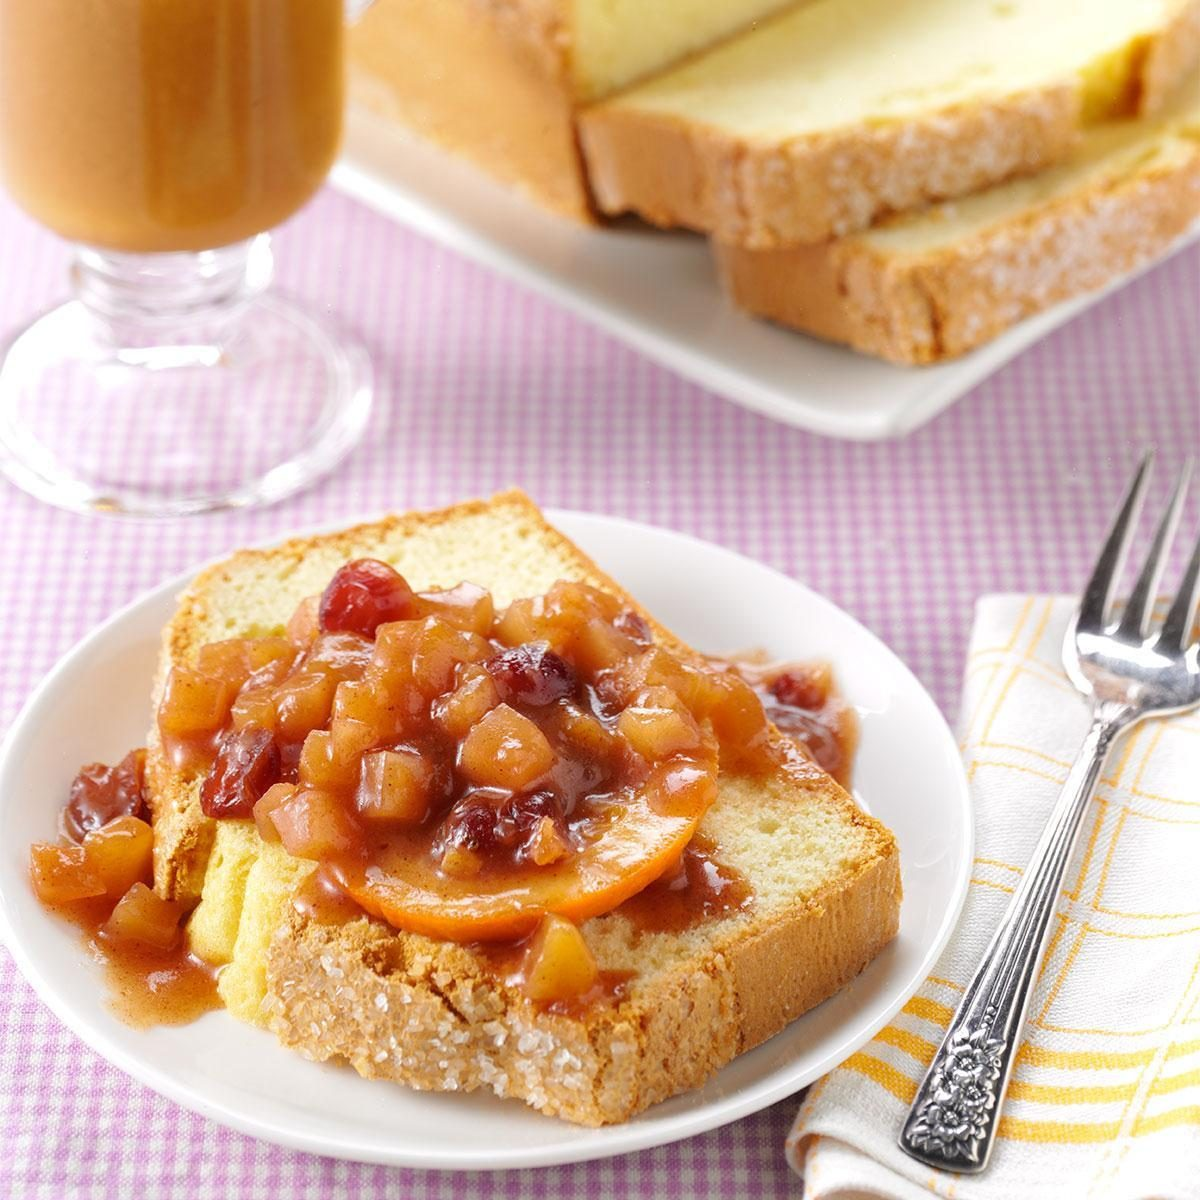 Pressure Cooker Apple-Pear Compote